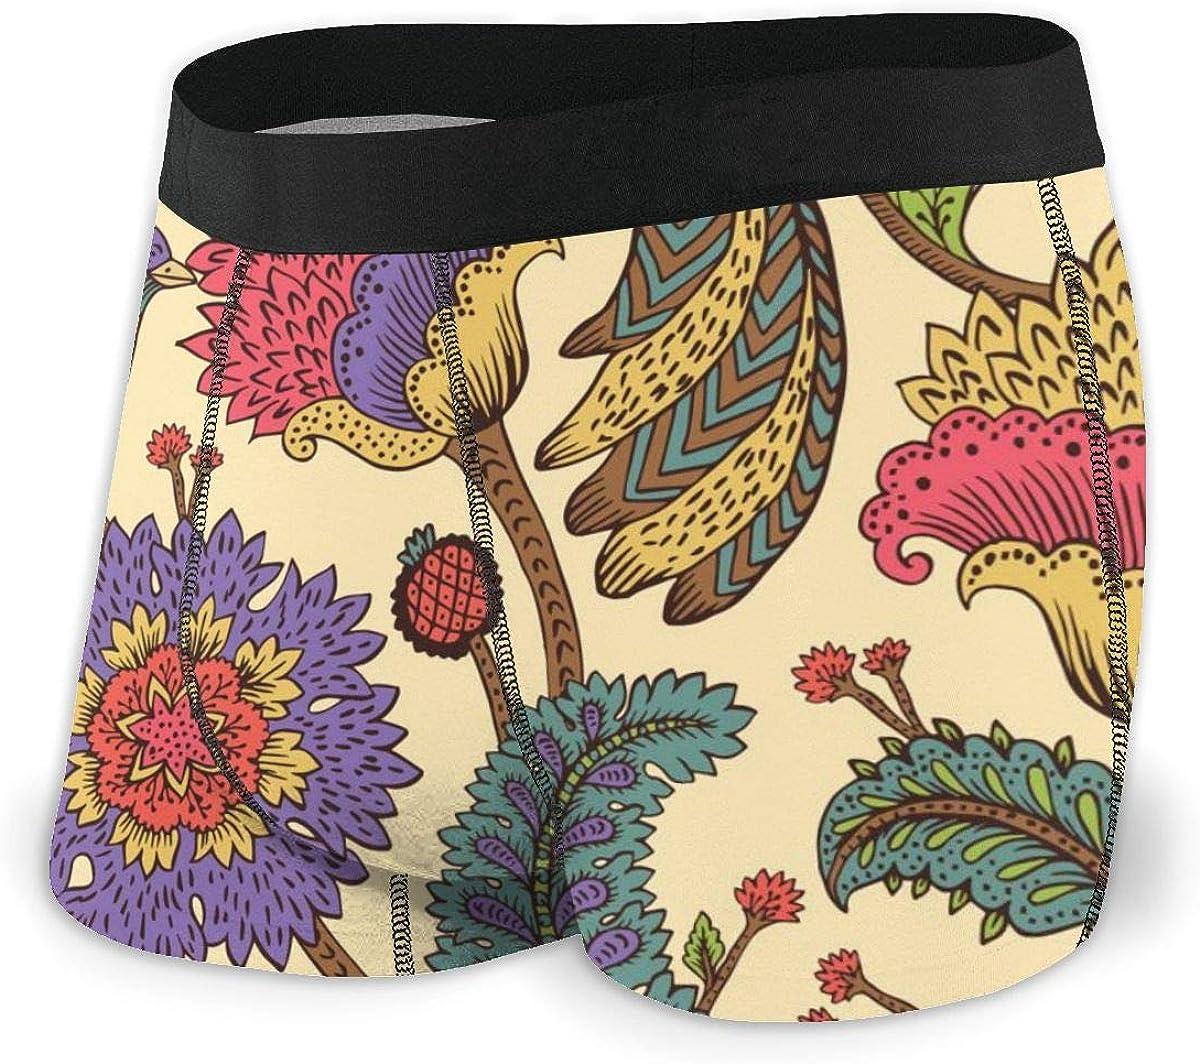 Randolph Wordsworth Mens Boxer Briefs Paisley Fantasy FlowersUnderwear Low Rise Trunks Boys Underpants